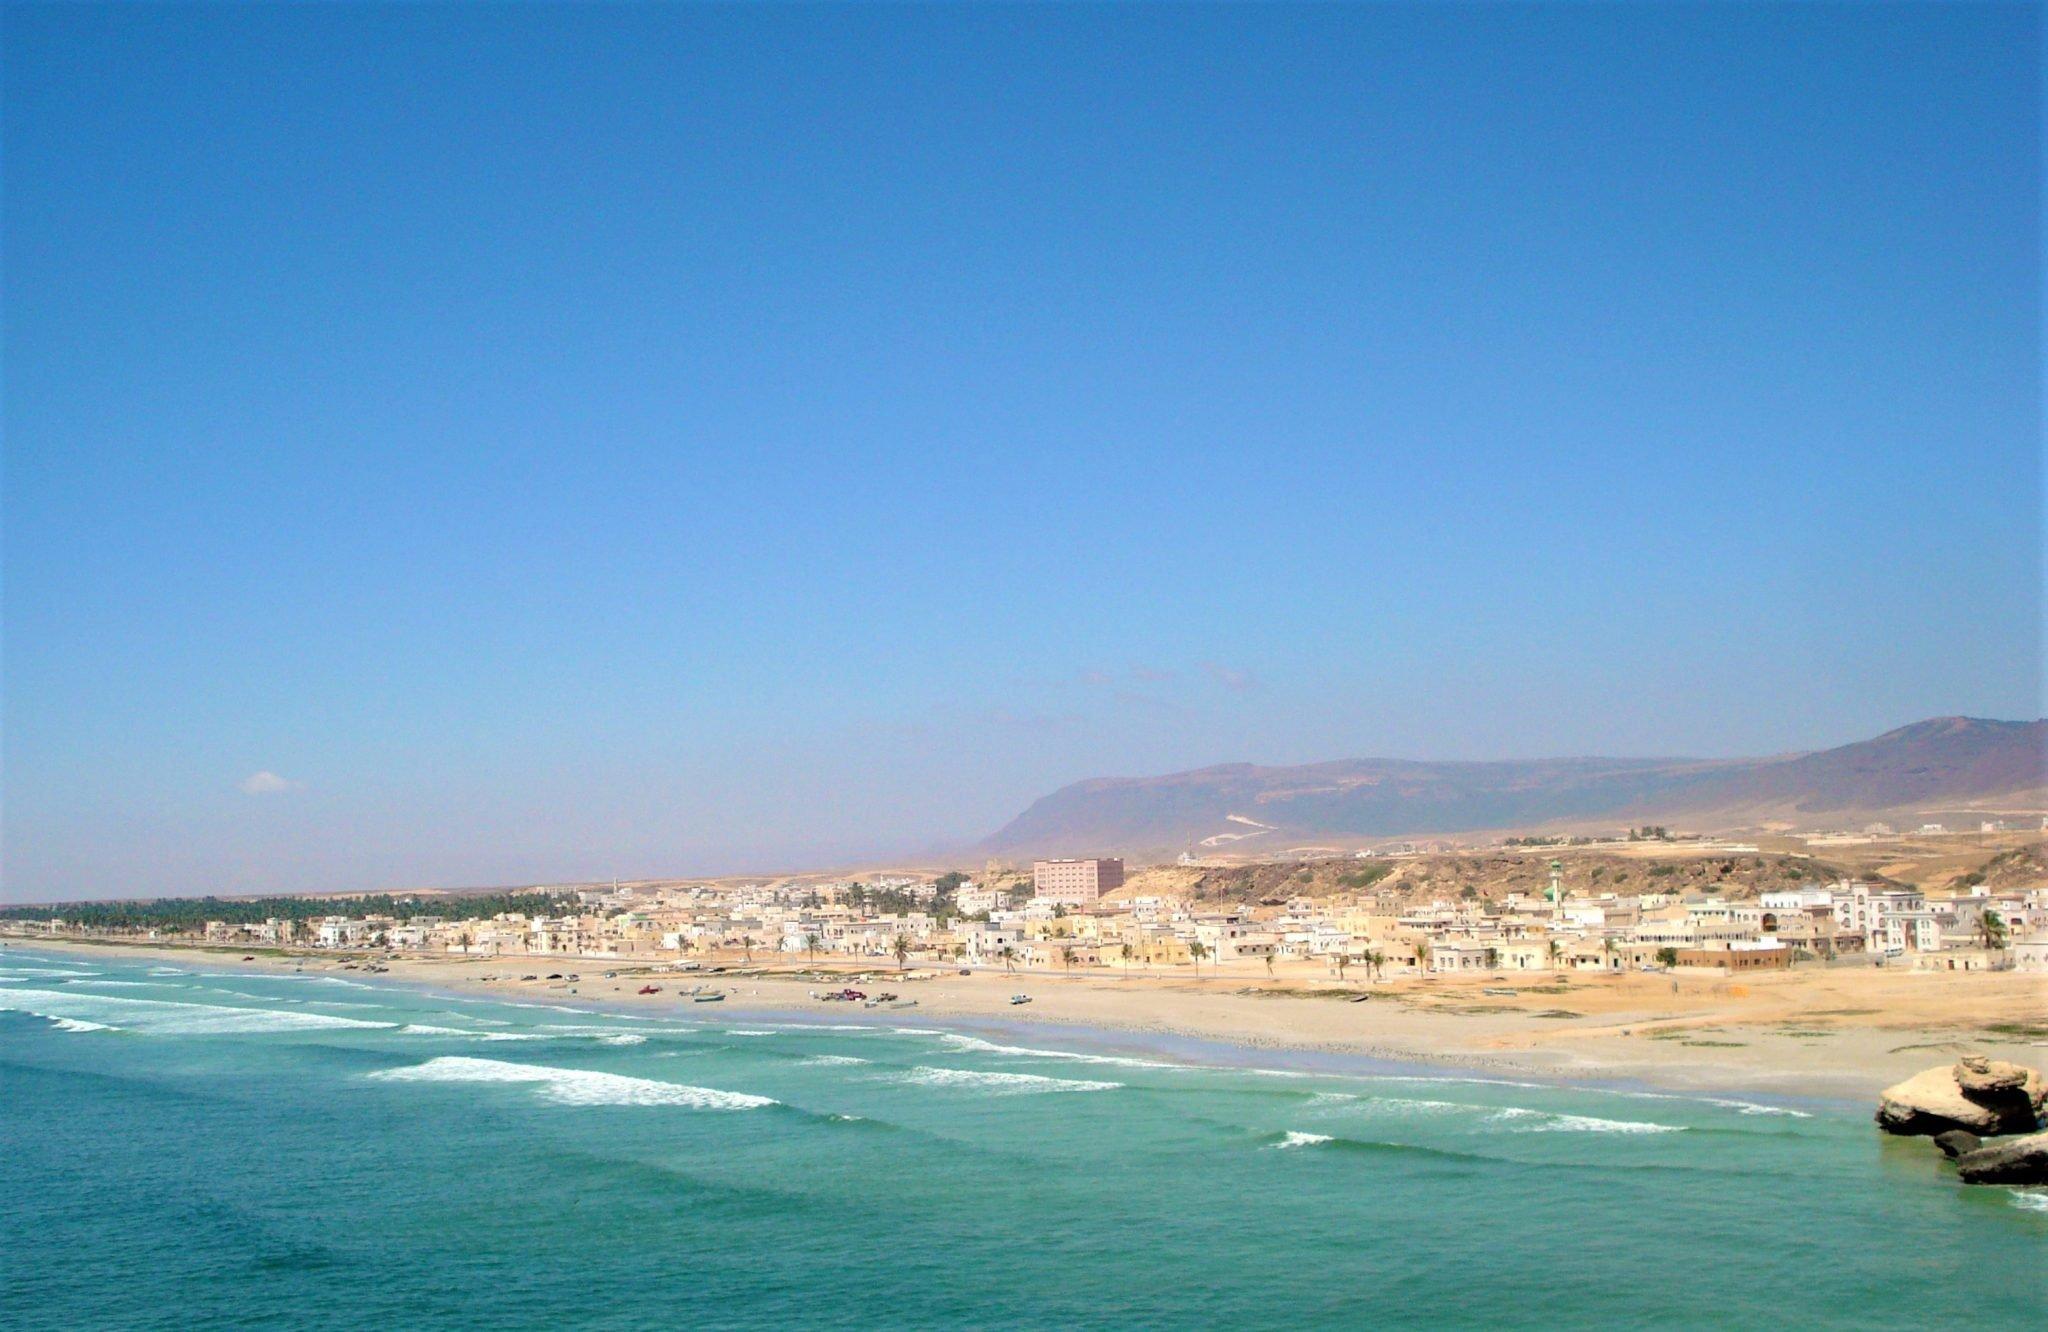 Salalah, Oman Tour During Khareef Season